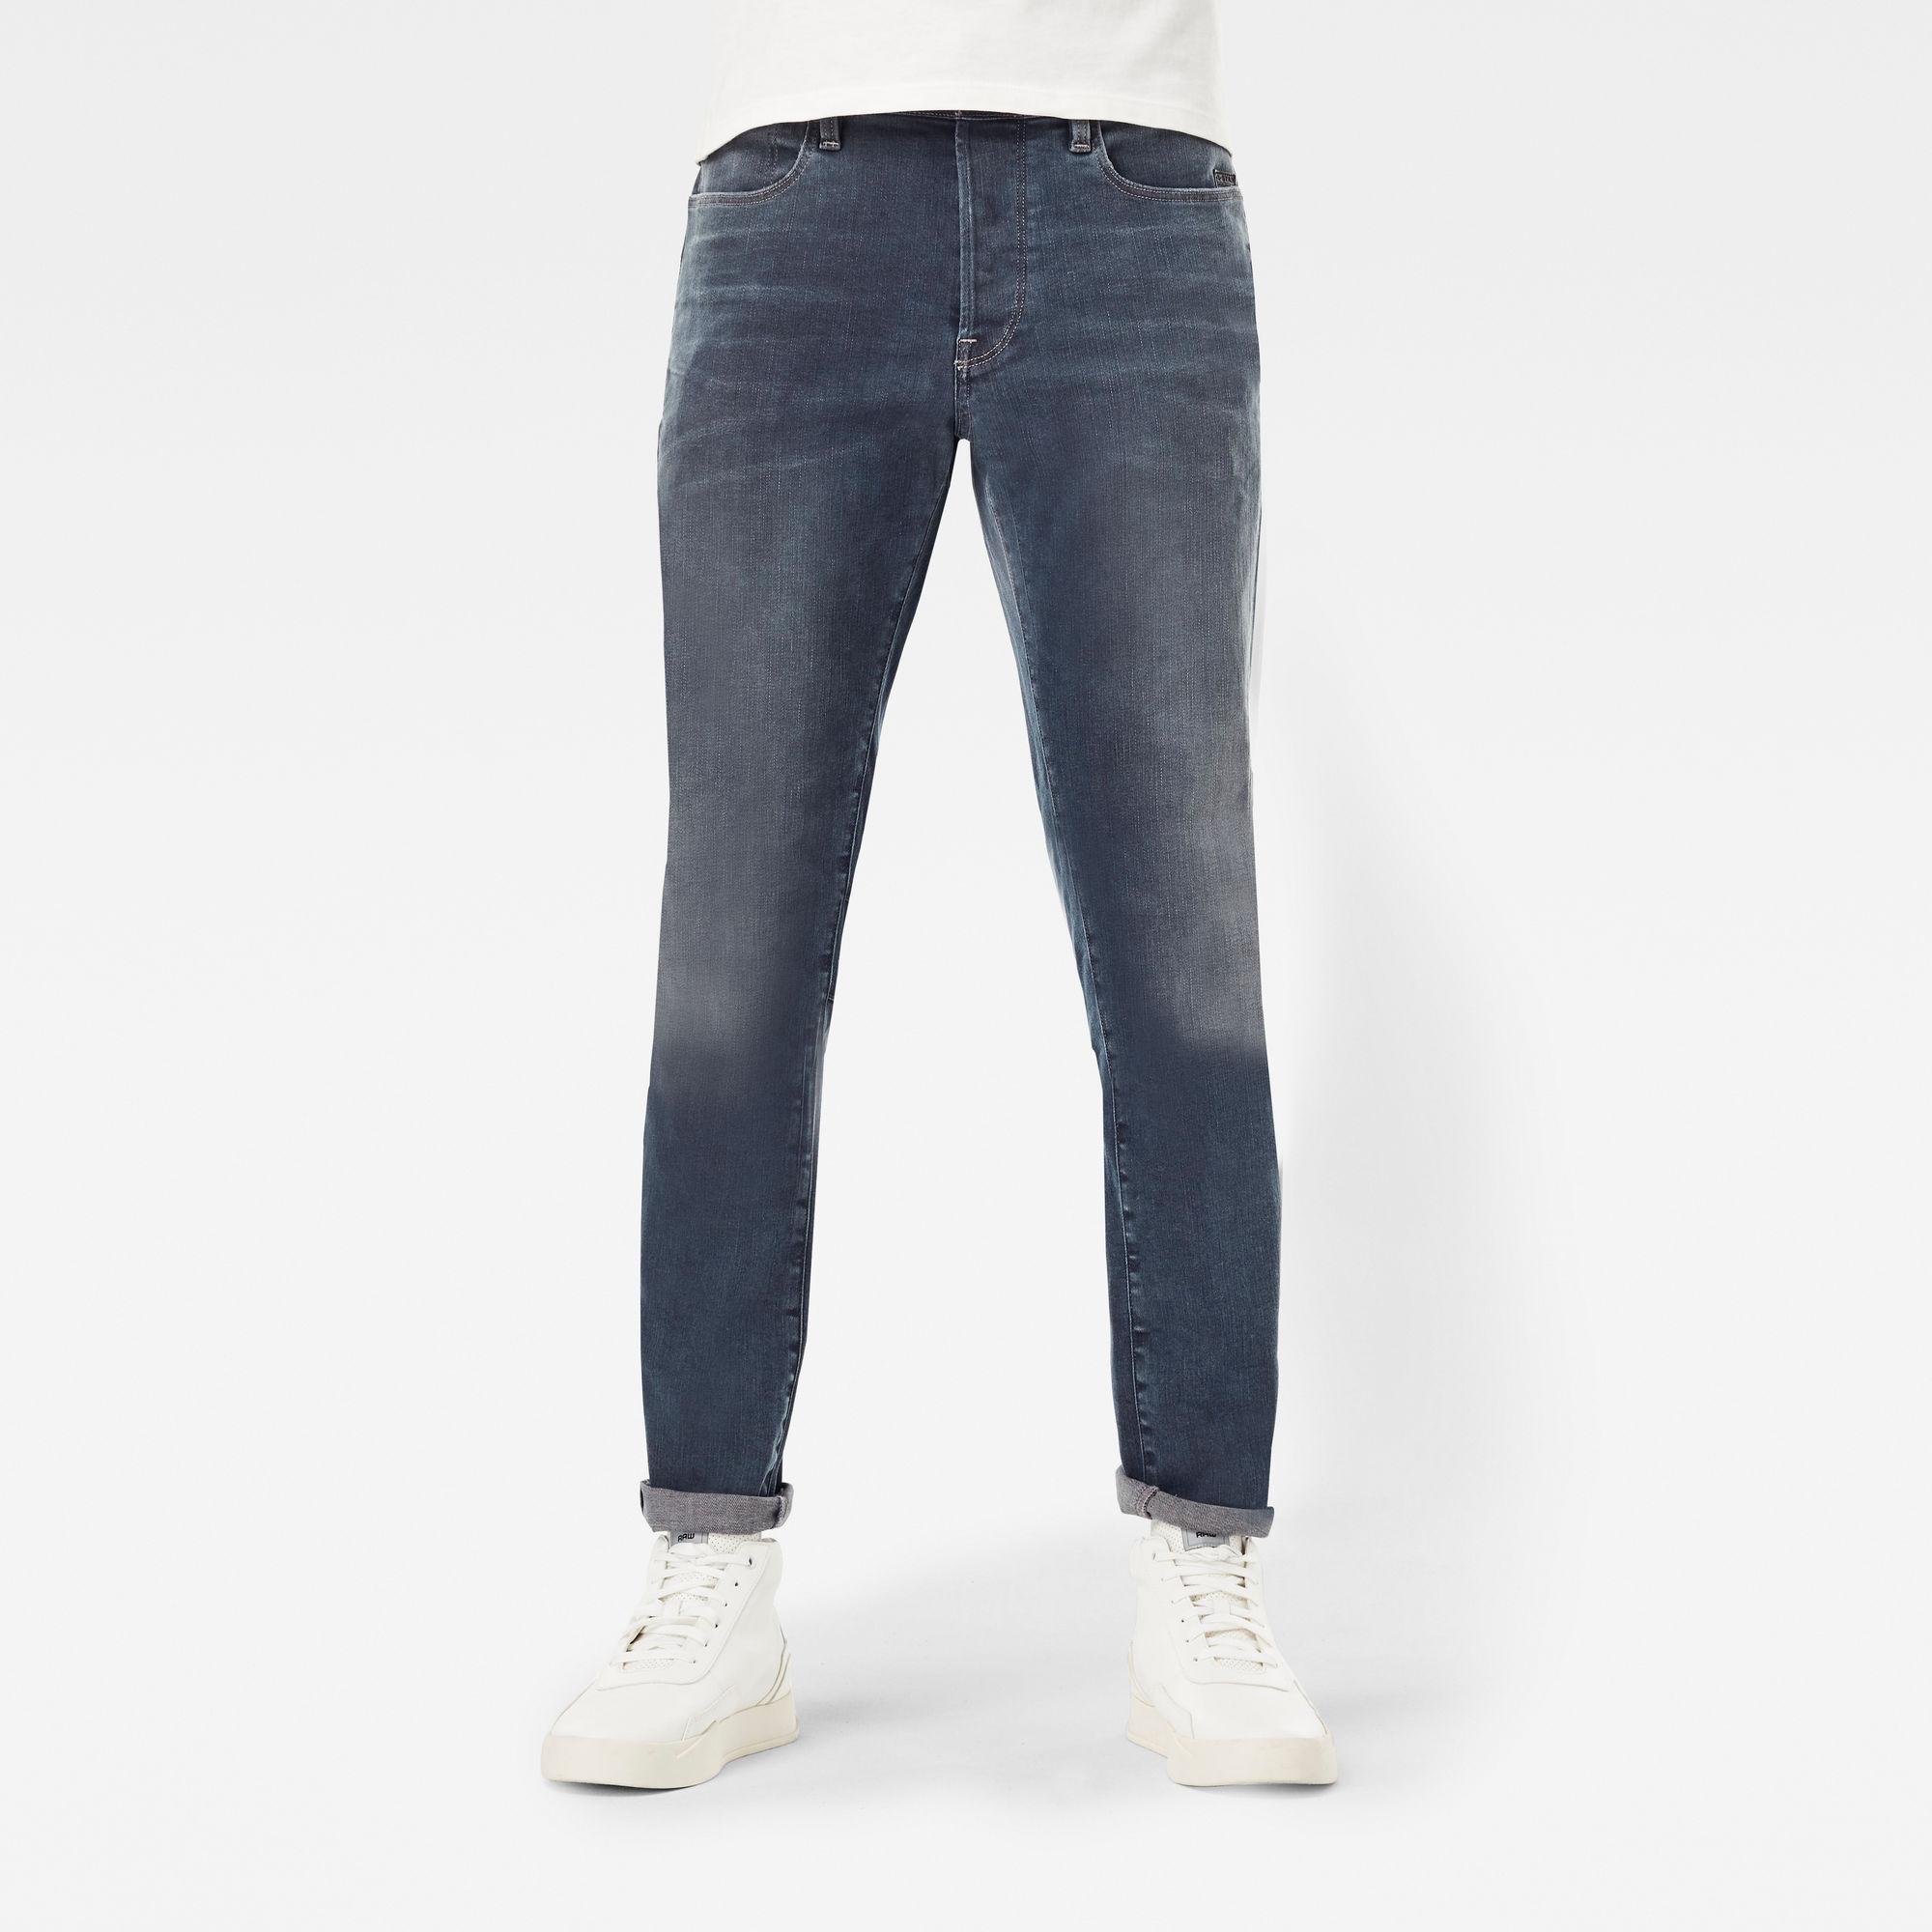 G-Star RAW Heren Citishield 3D Slim Tapered Jeans Donkerblauw